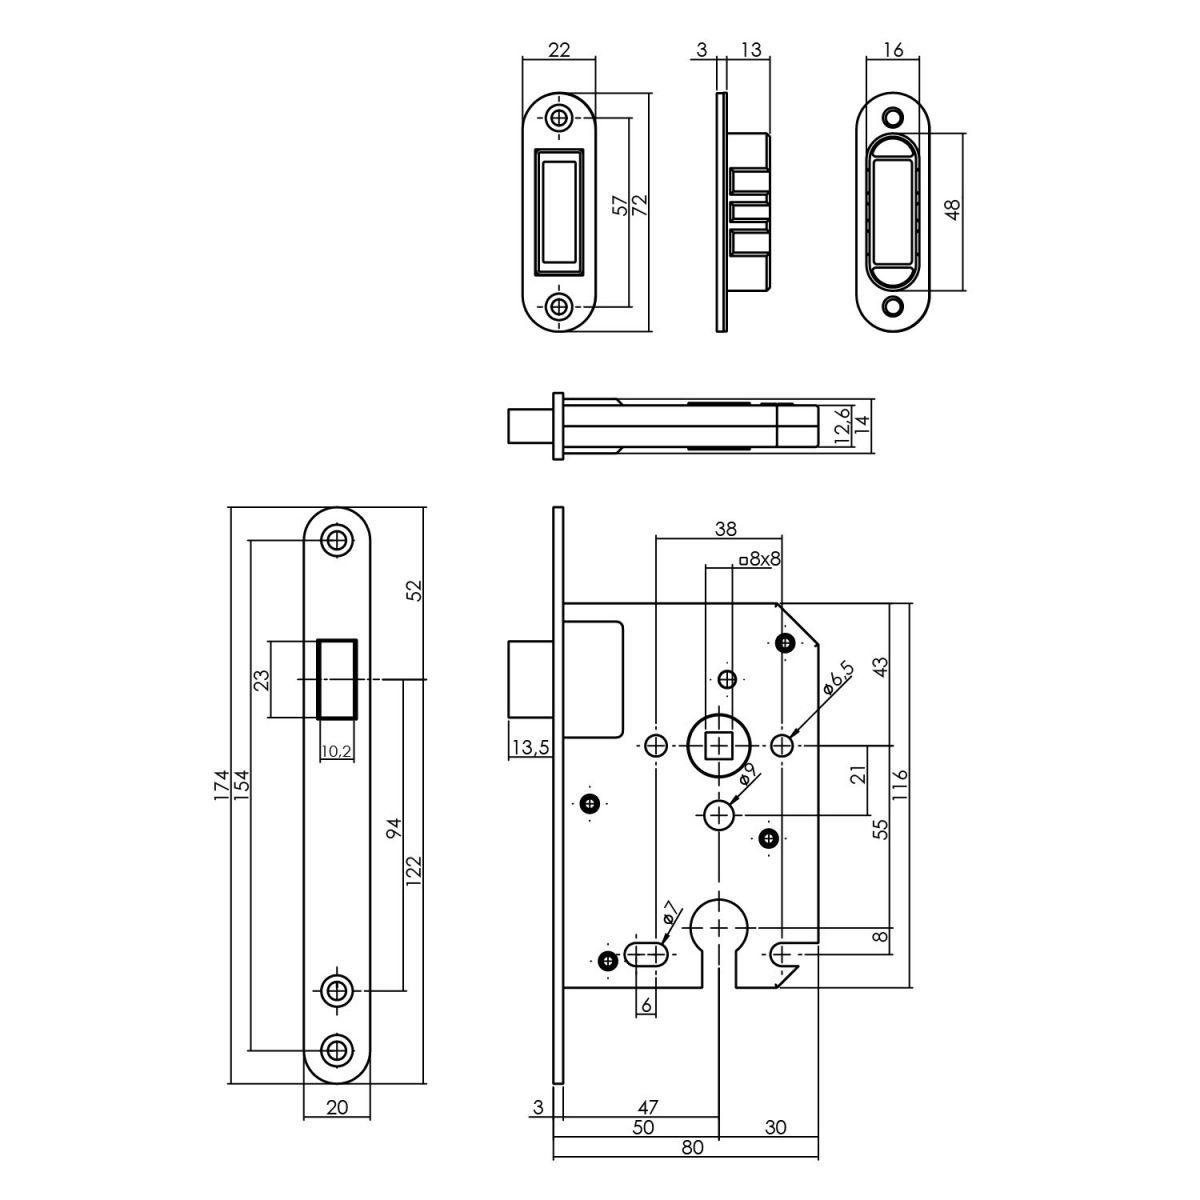 magneetcilinderslotmetrvsvoorplaat6796nlgjpg